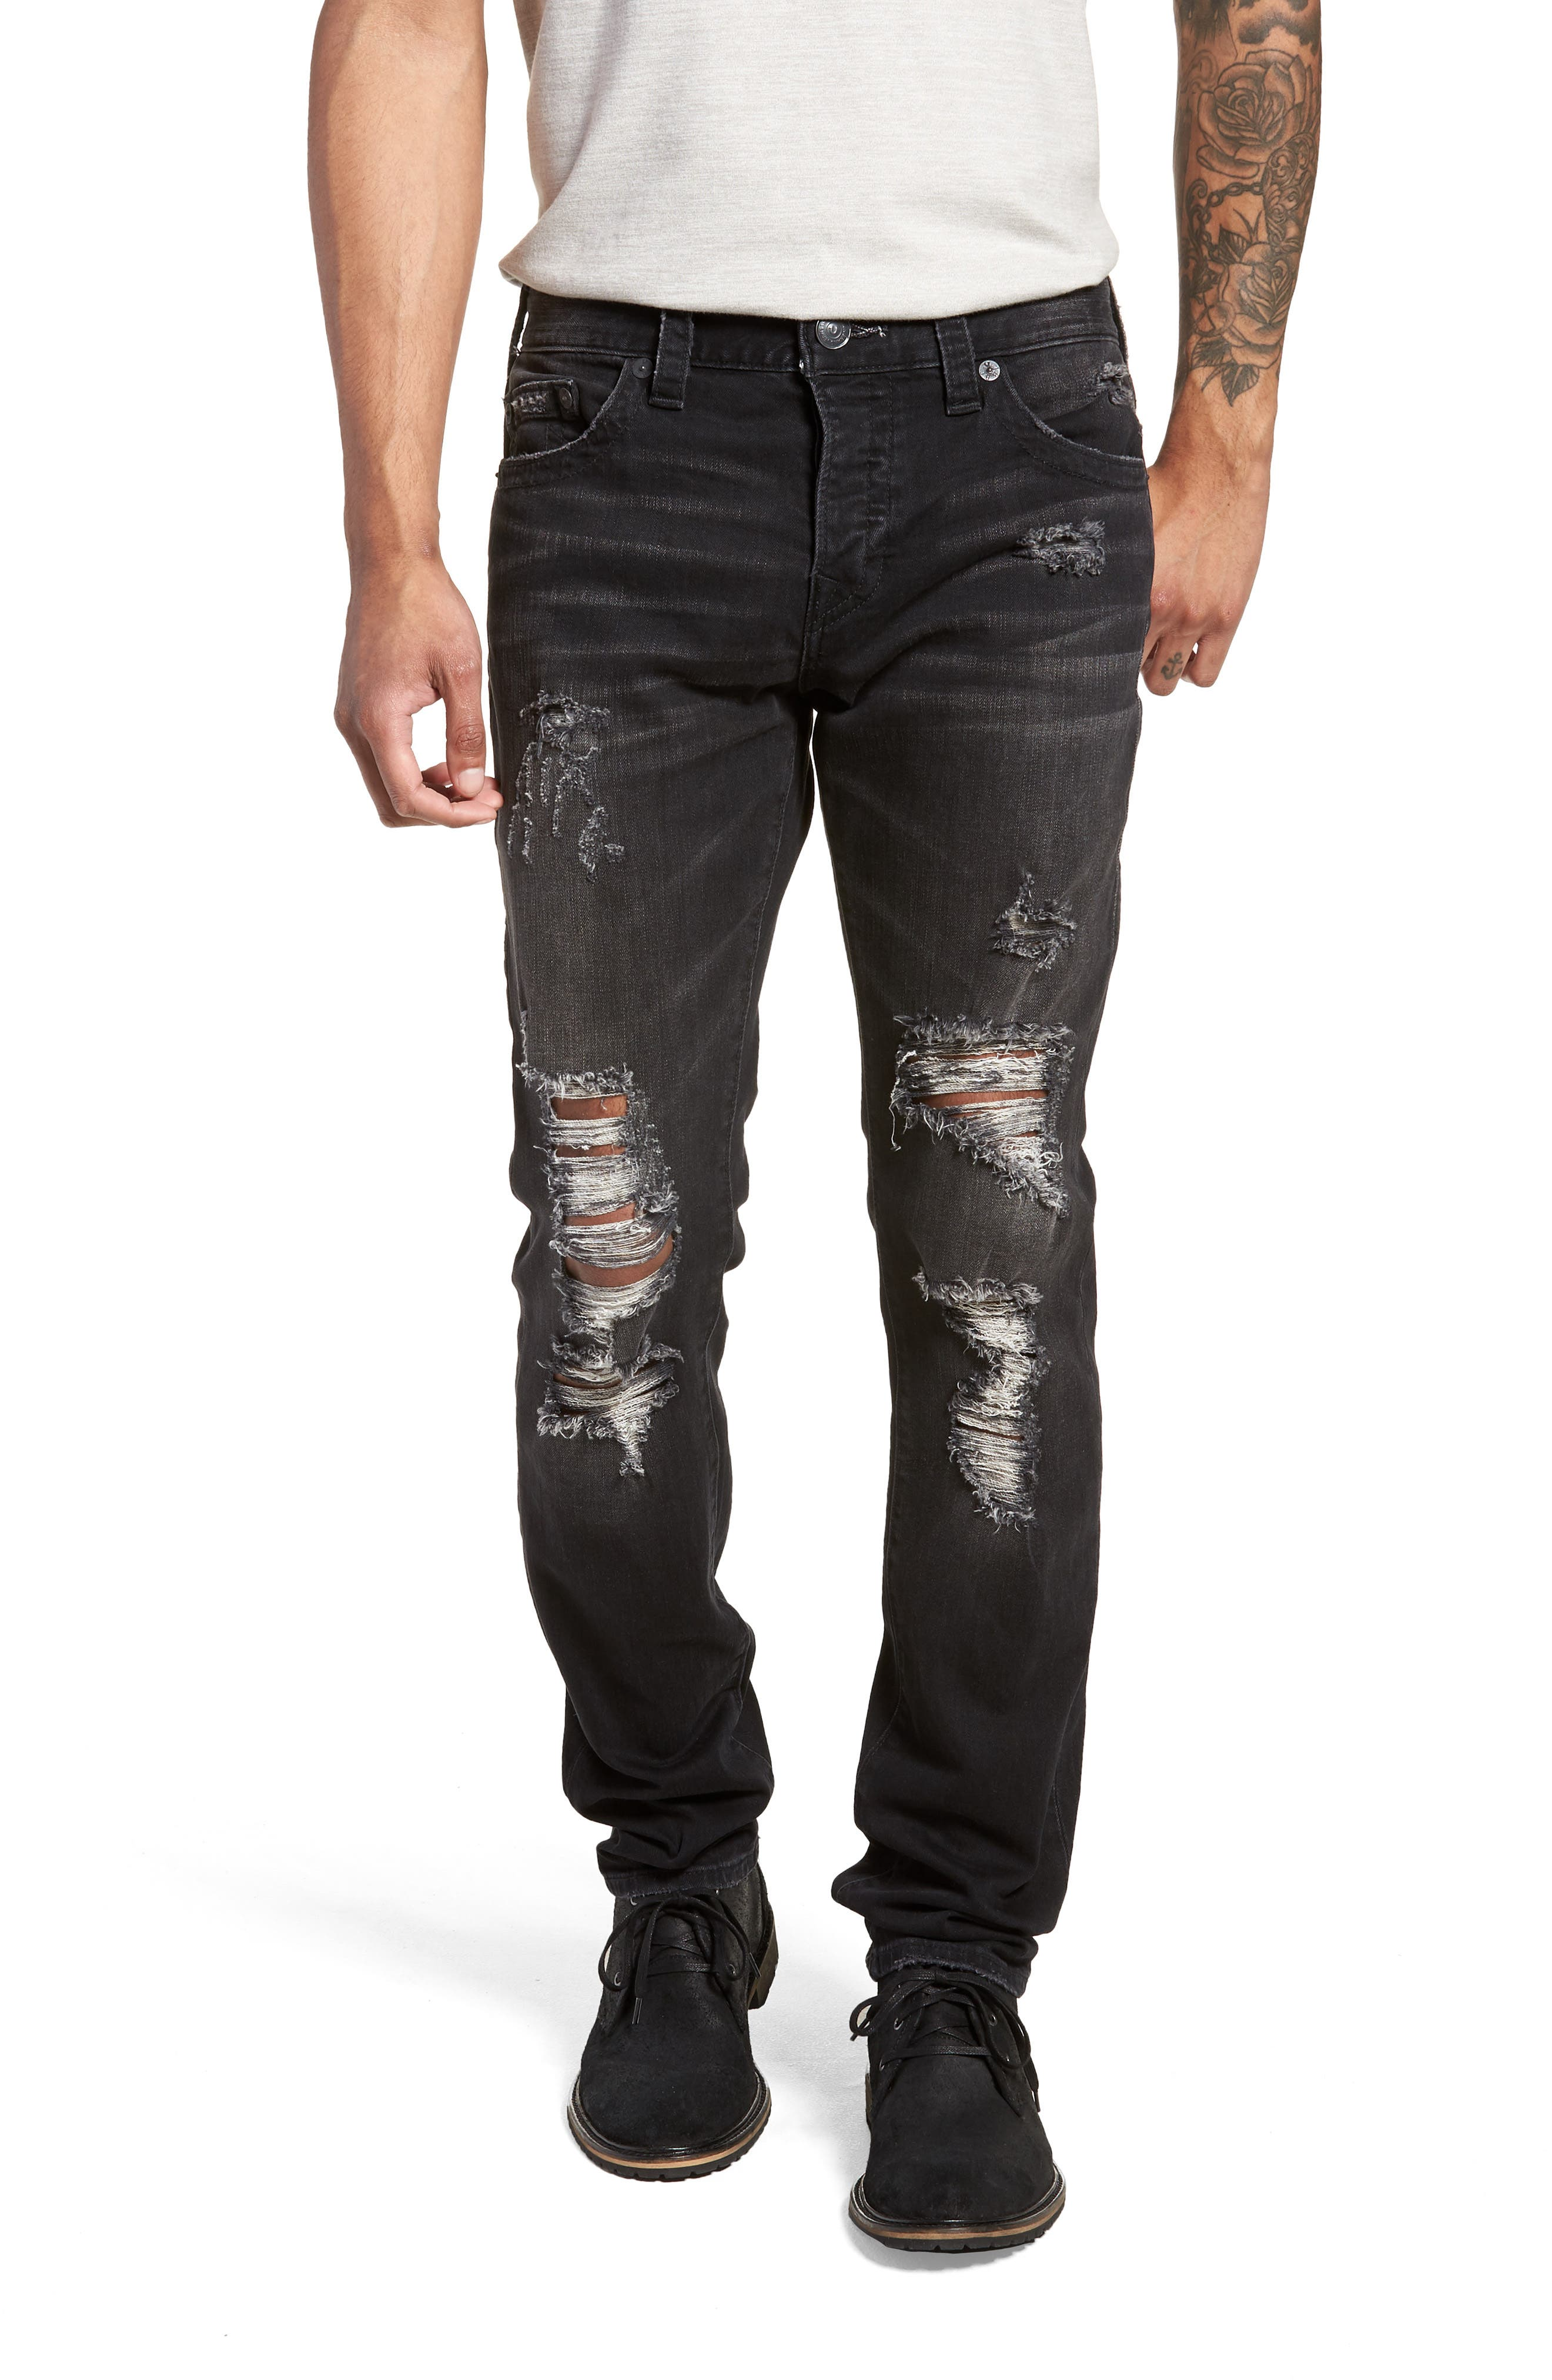 Rocco Skinny Fit Jeans,                         Main,                         color, EQYD DARK STREET